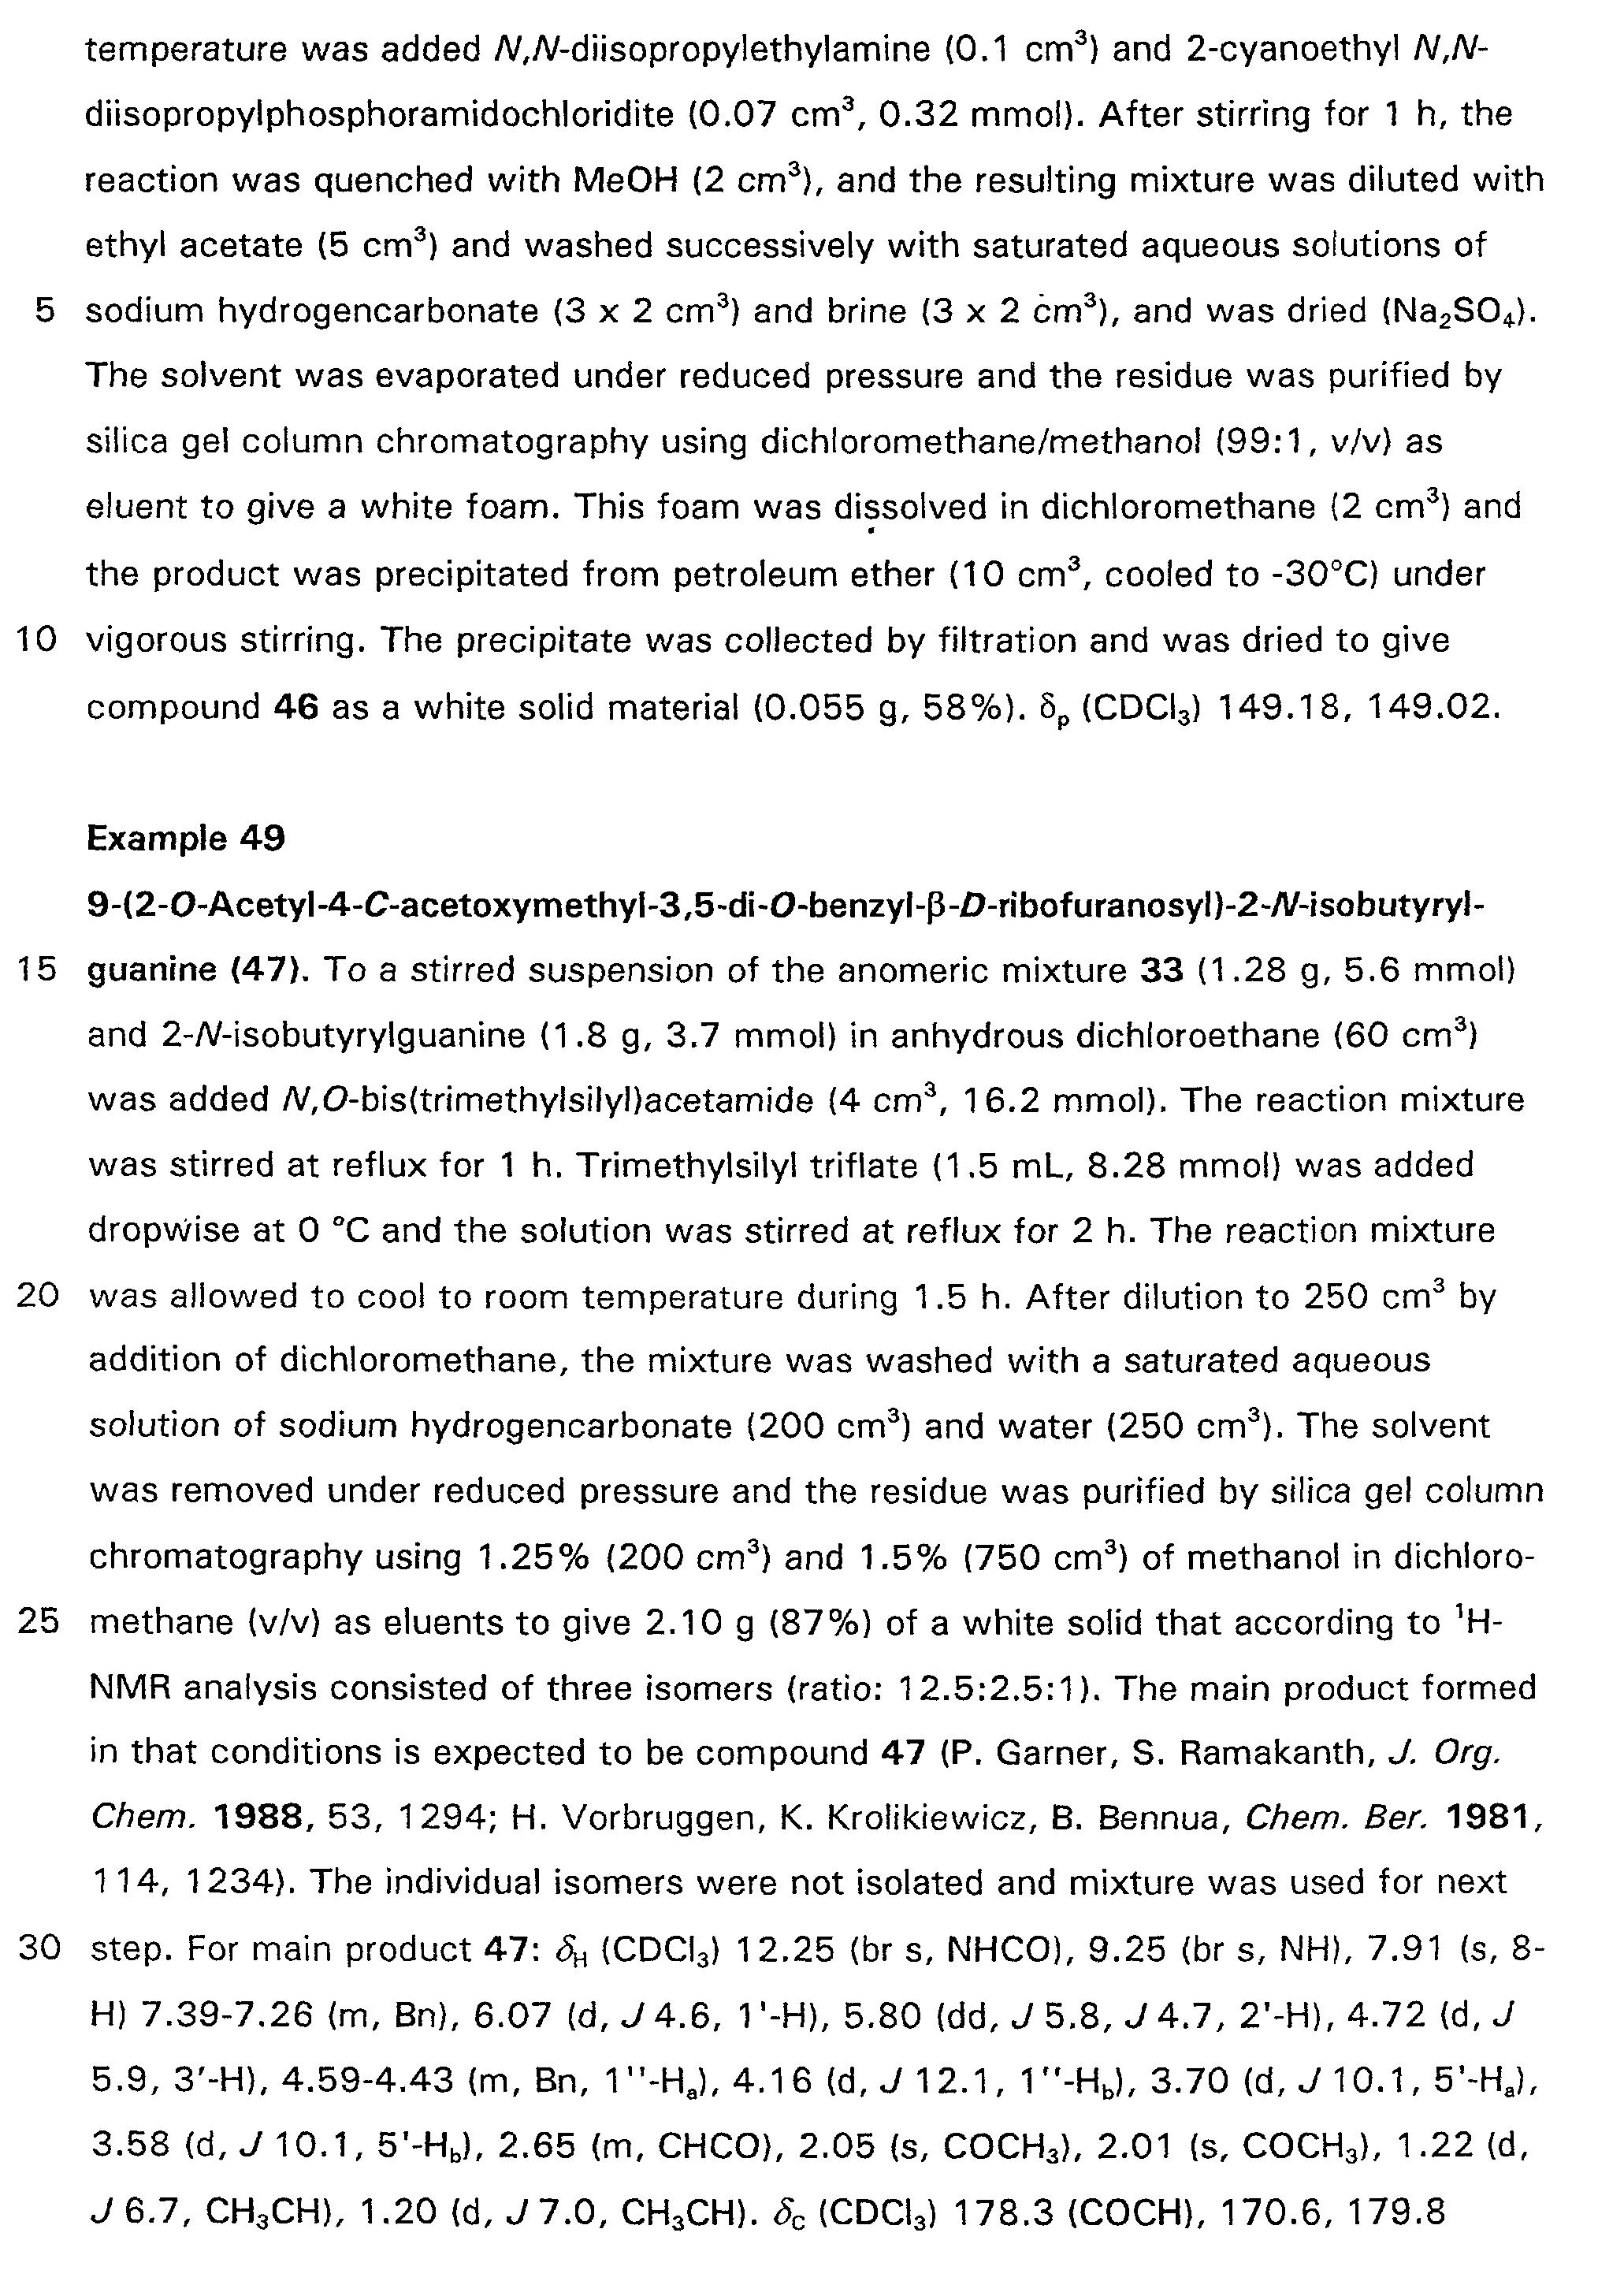 US A1 Oligonucleotide analogues Google Patents